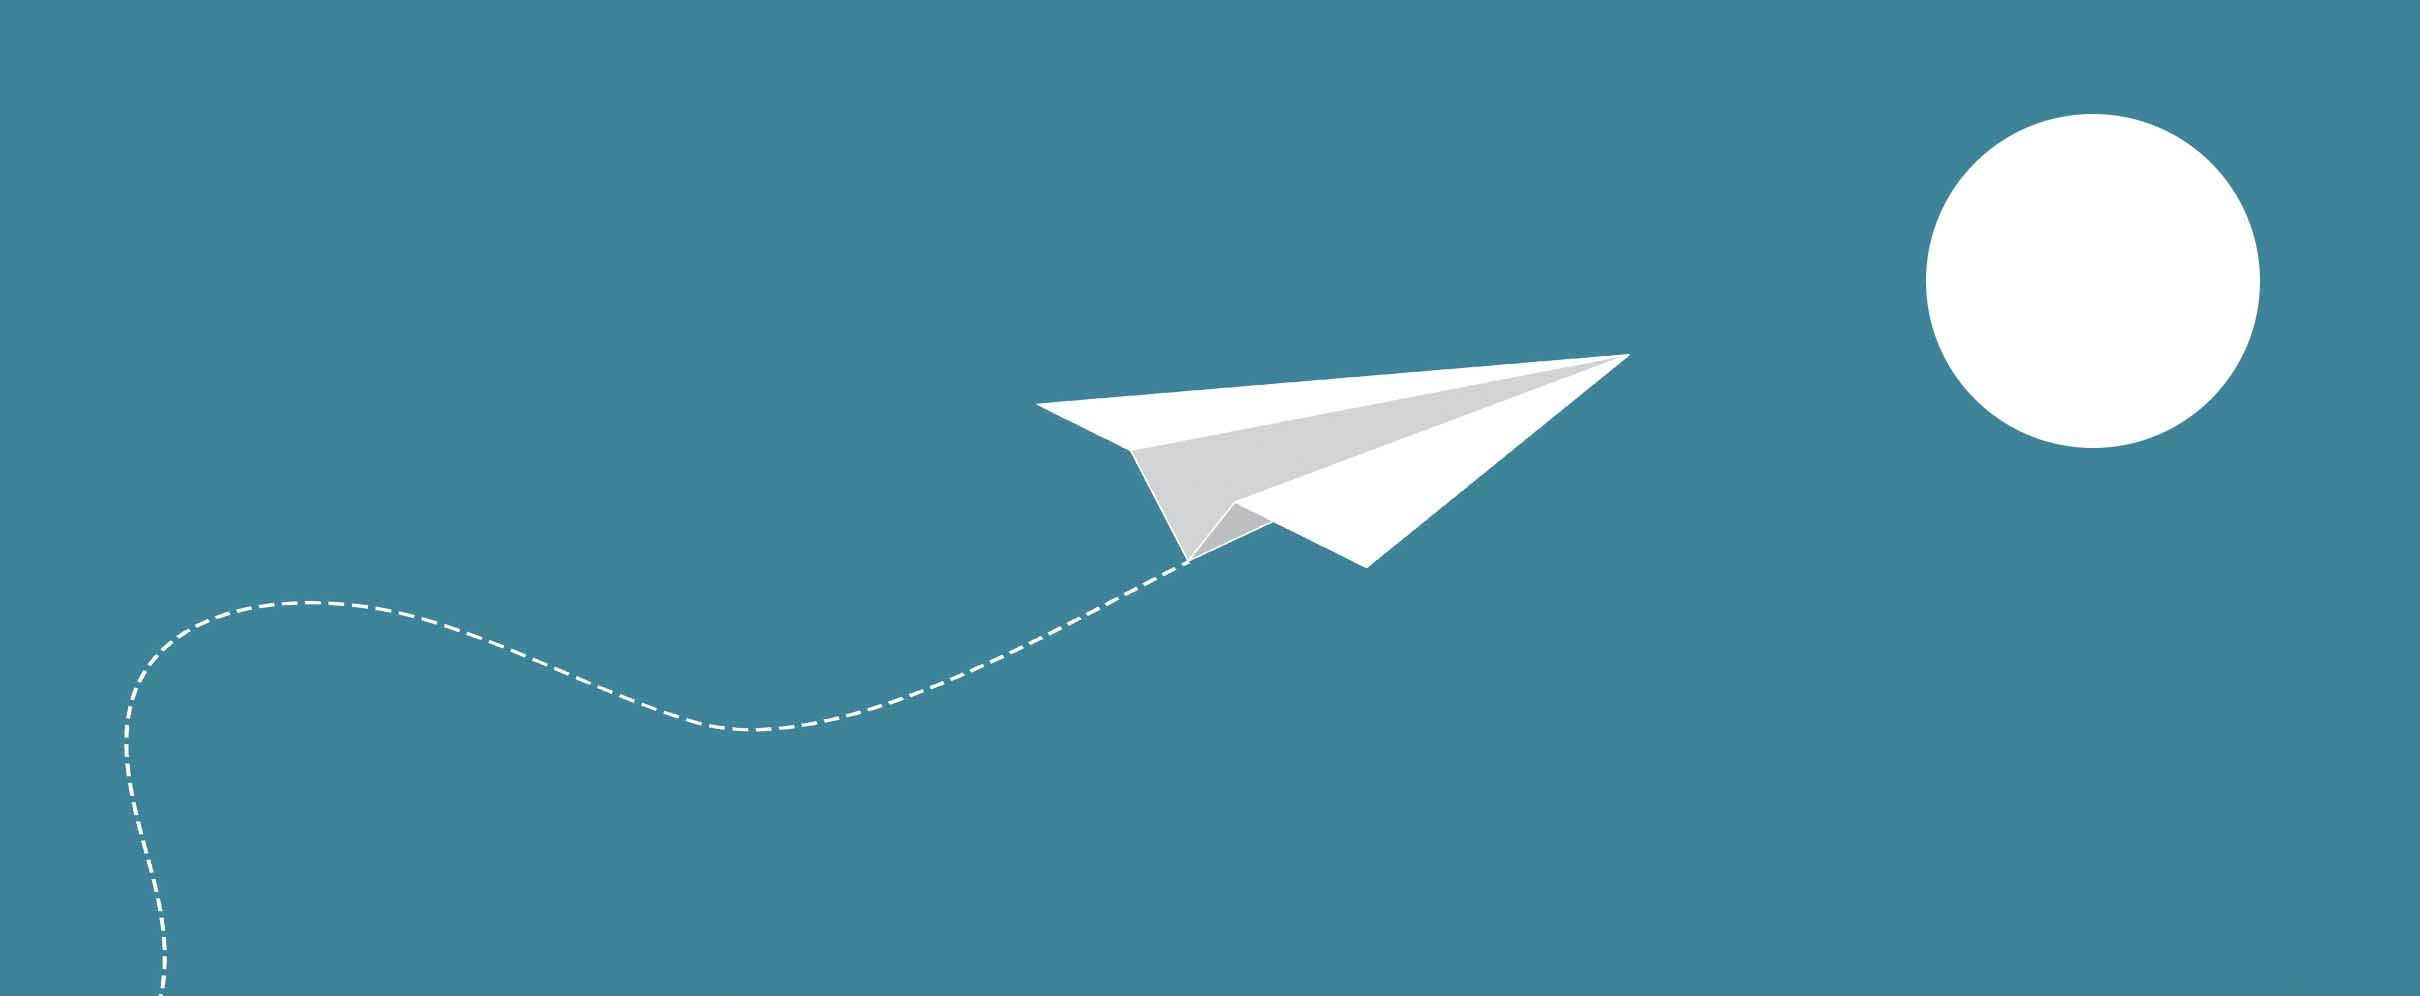 4 Tips for Telegram Affiliate Marketing Success